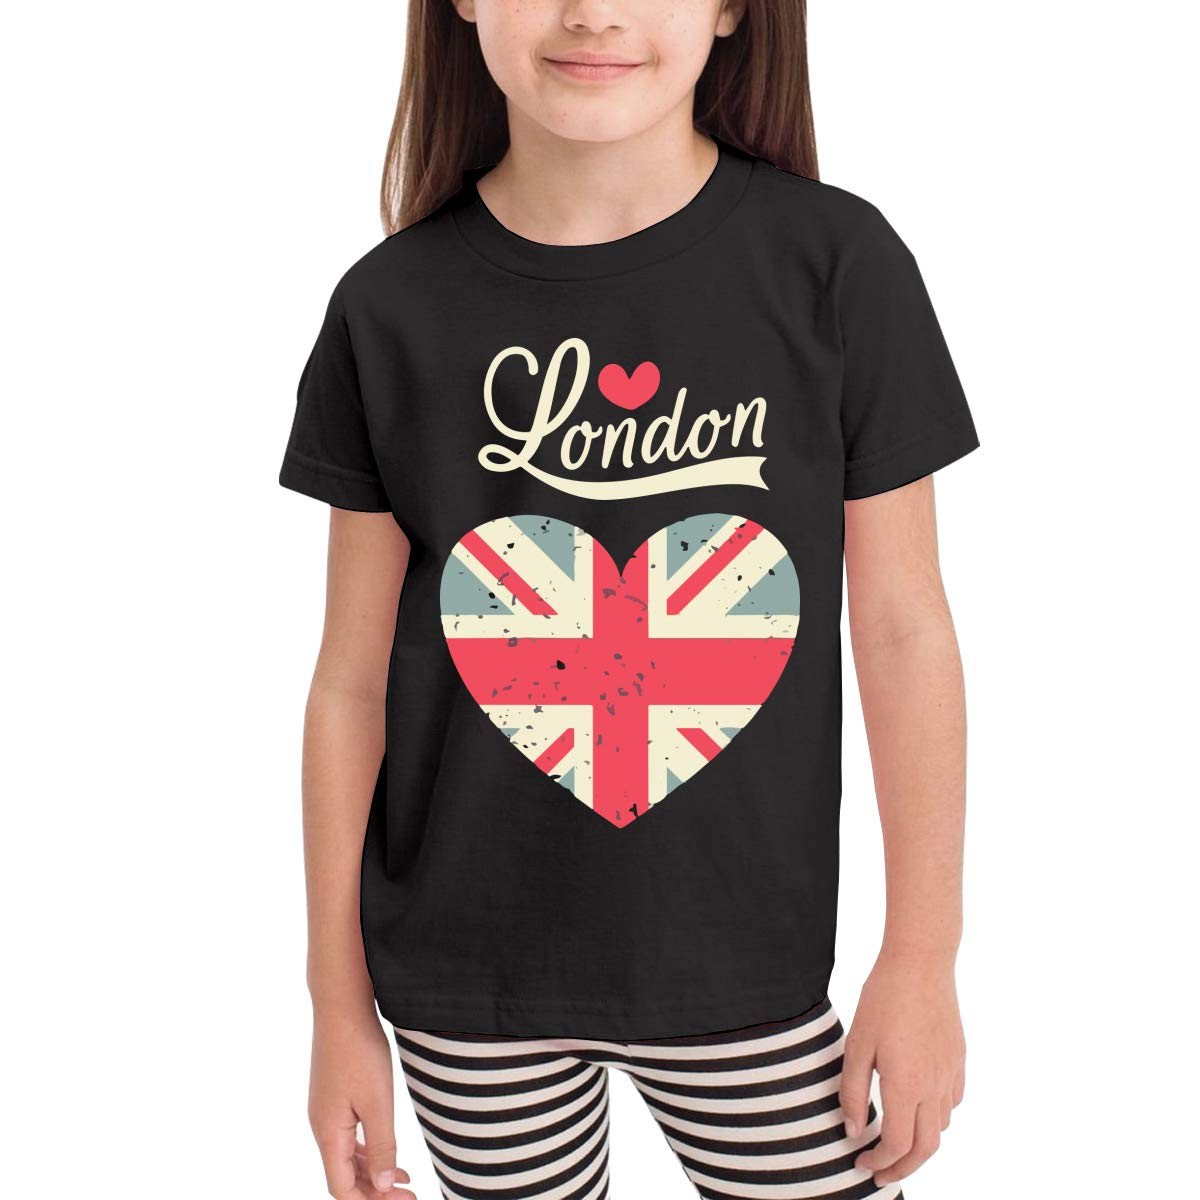 Short Sleeve Vintage London Love Flag Heart Shirts for Girls 2-6T Fashion Tunic Tops